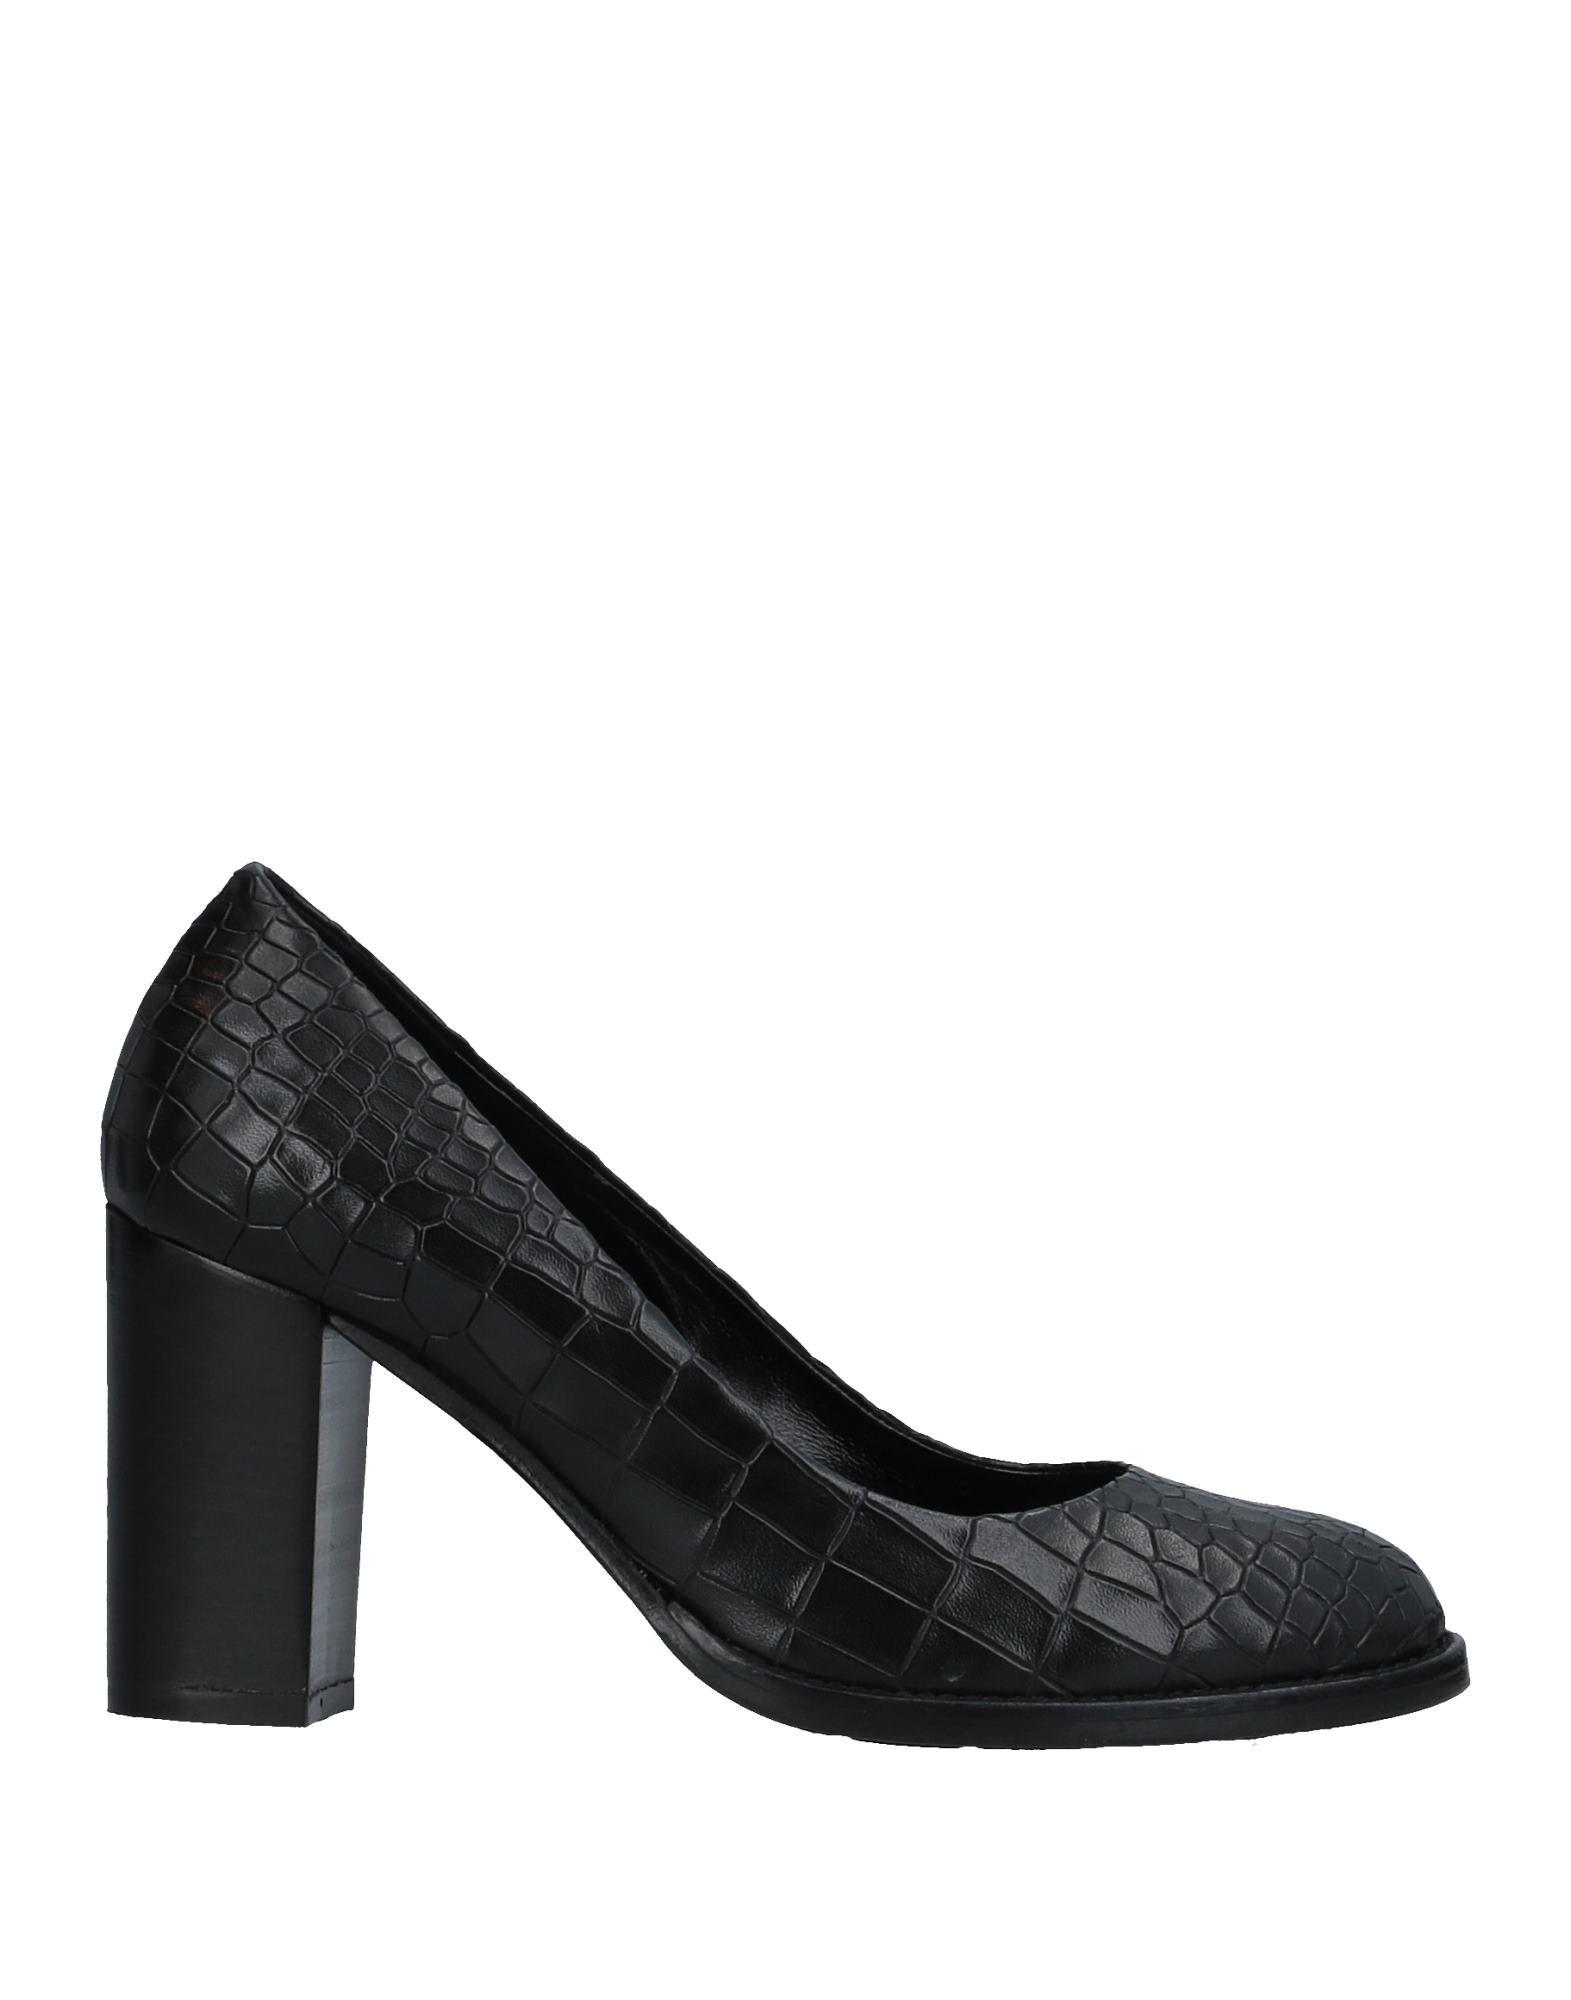 Sensunique Pumps Damen  11508871JF Gute Qualität beliebte Schuhe